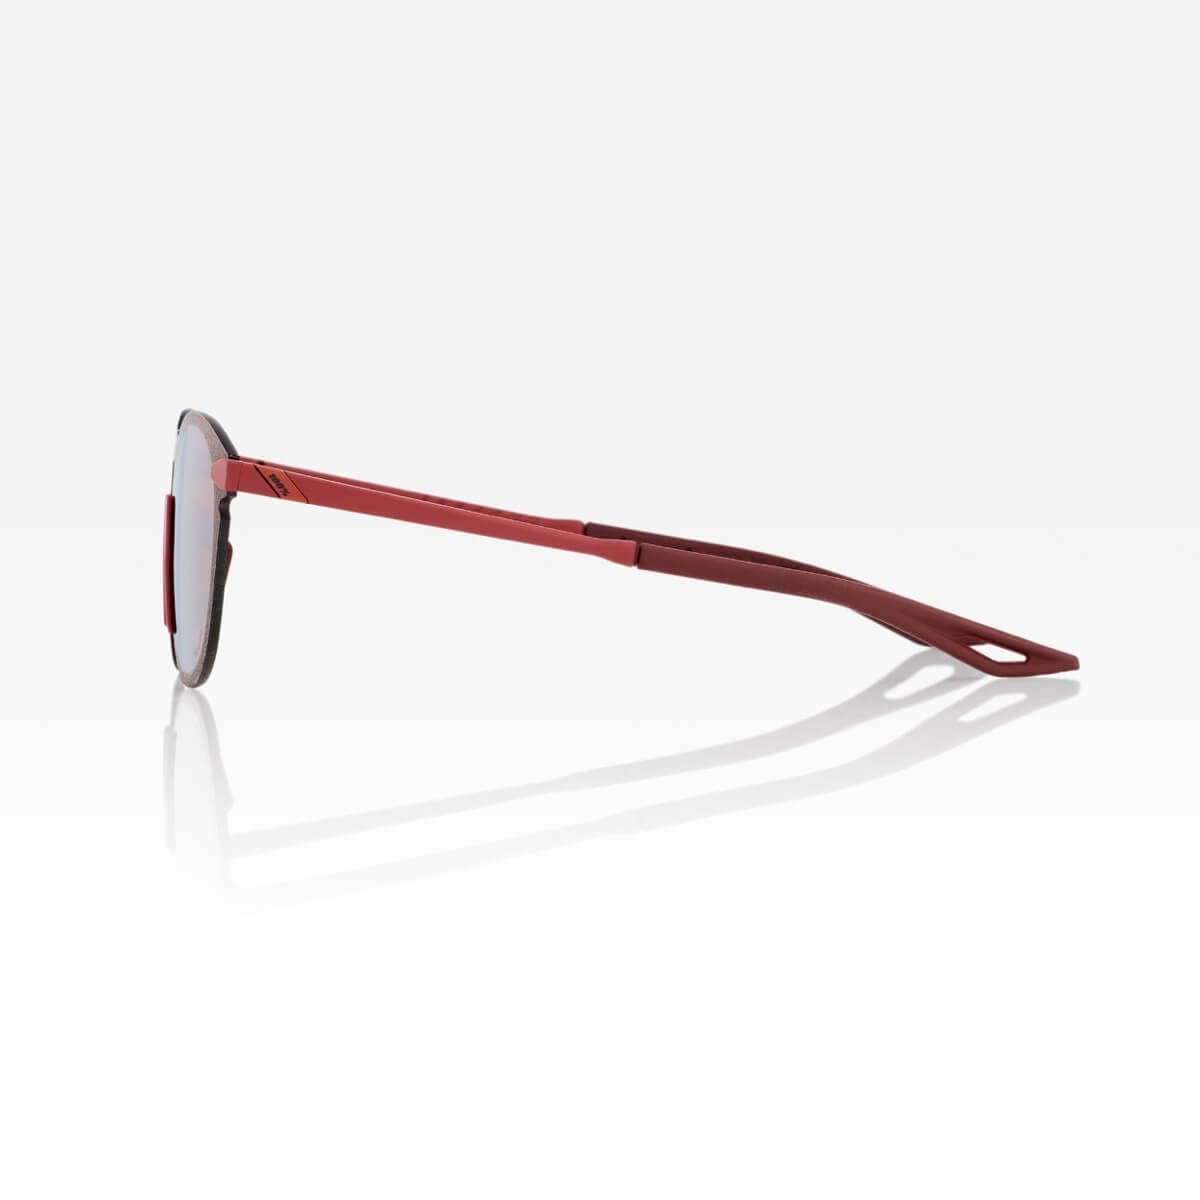 LEGERE Round – Soft Tact Crimson – HiPER Silver Mirror Lens